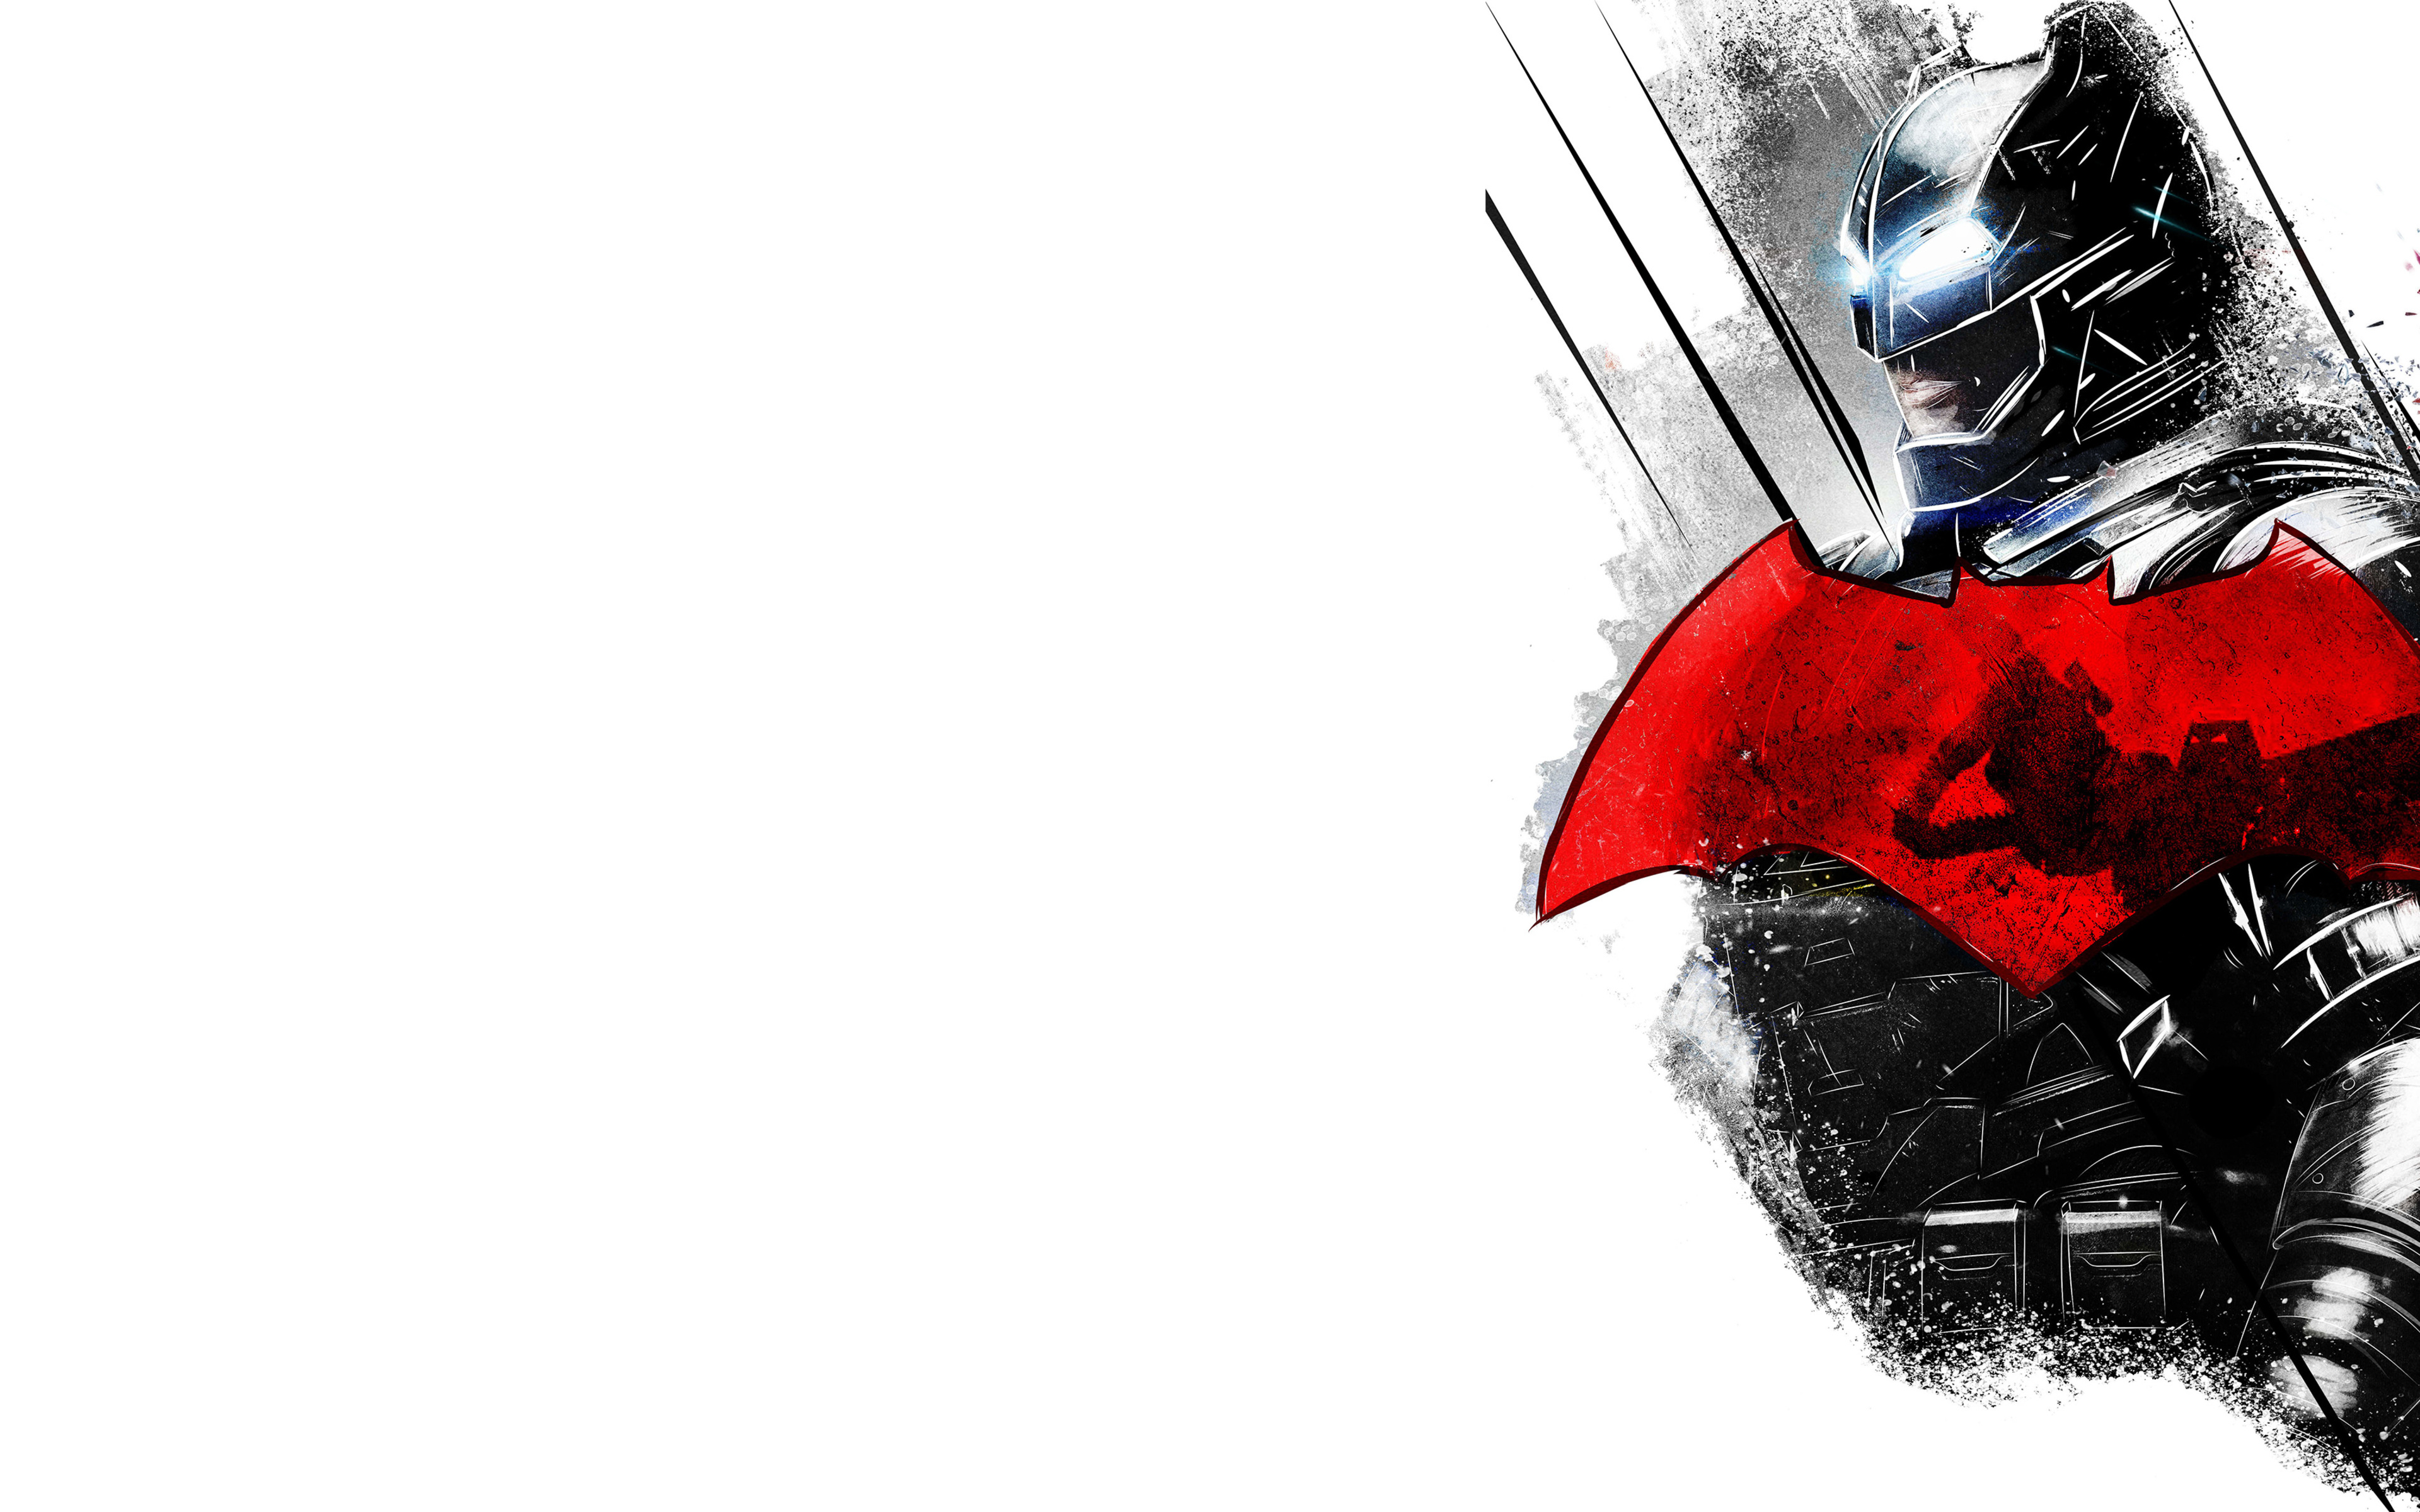 batman-dawn-of-justice-artwork-4k-nv.jpg